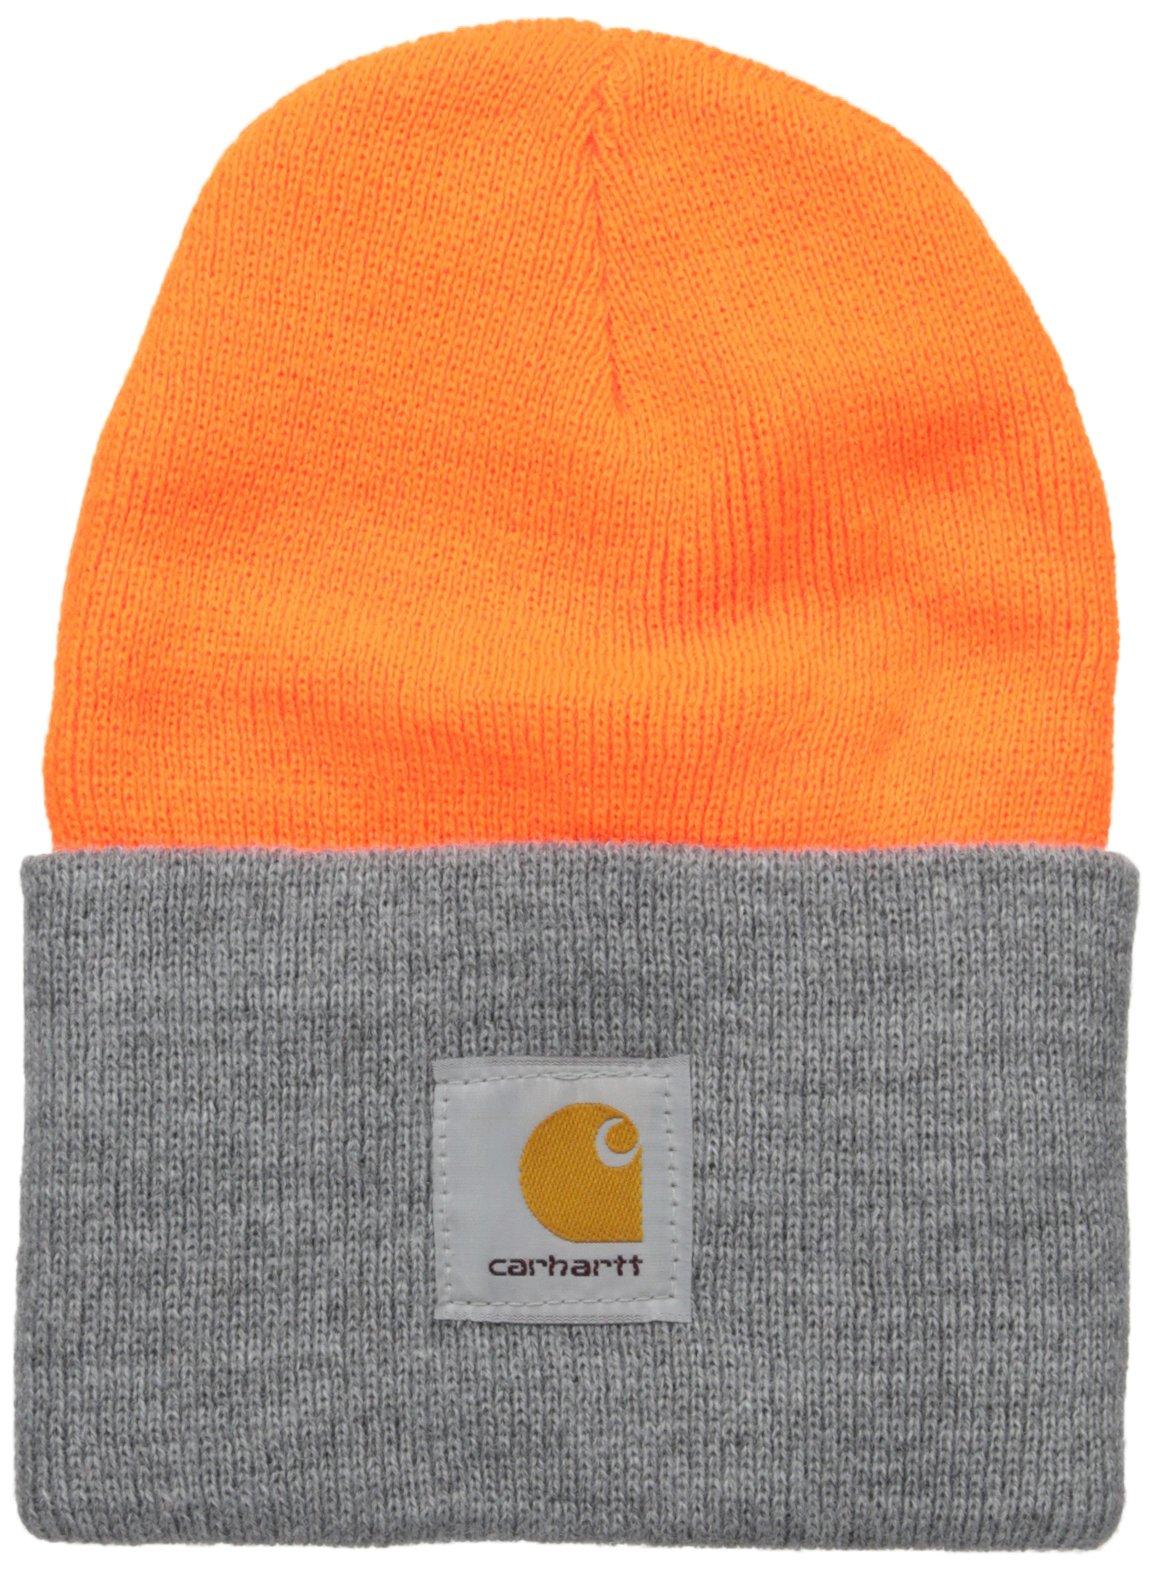 Carhartt Men's Acrylic Watch Hat A18, Brite Orange/Heather Grey, One Size by Carhartt